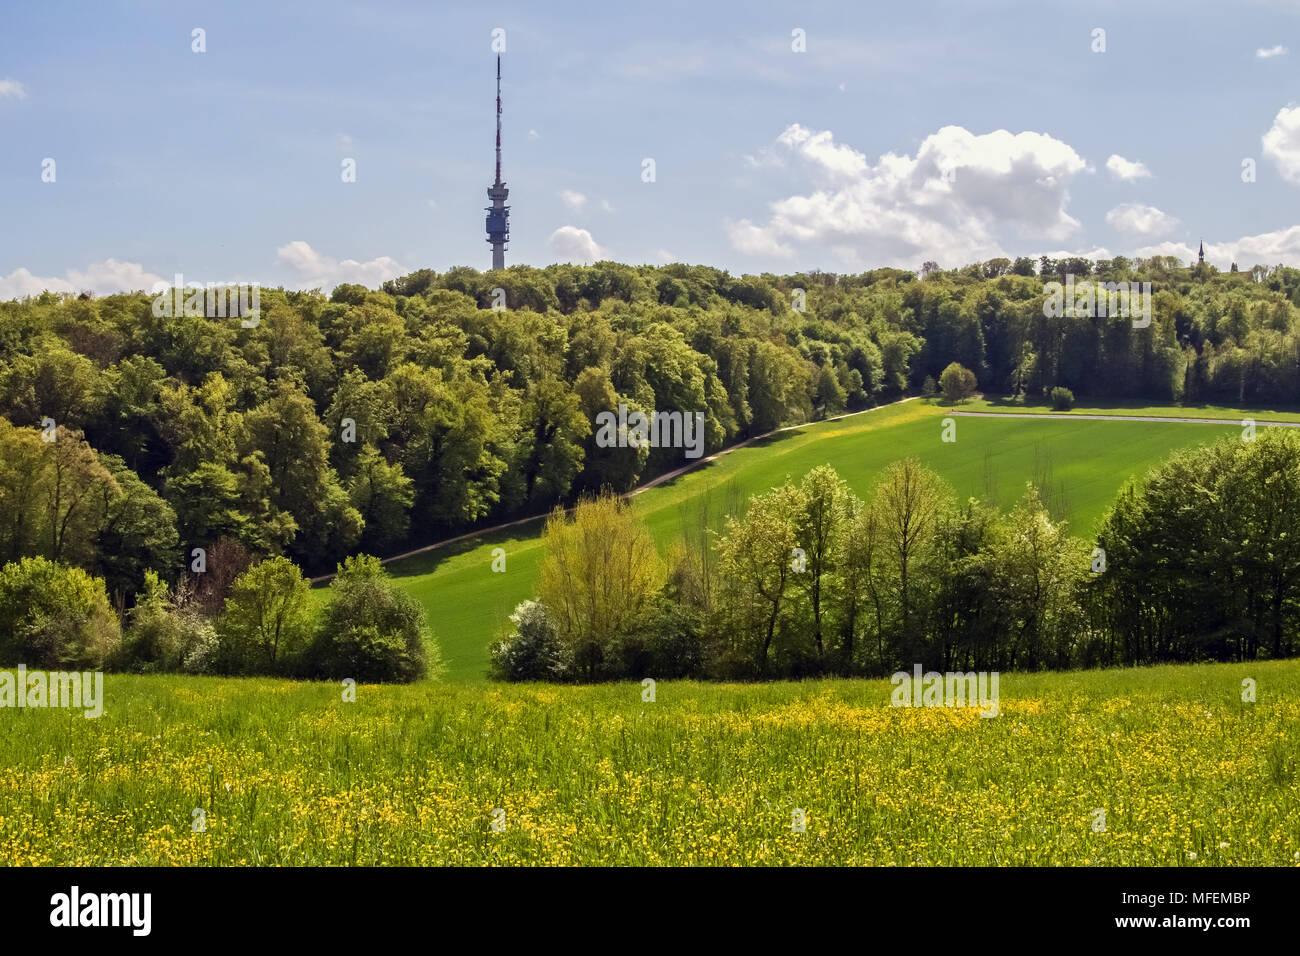 Bettingen/basel this weeks golf betting